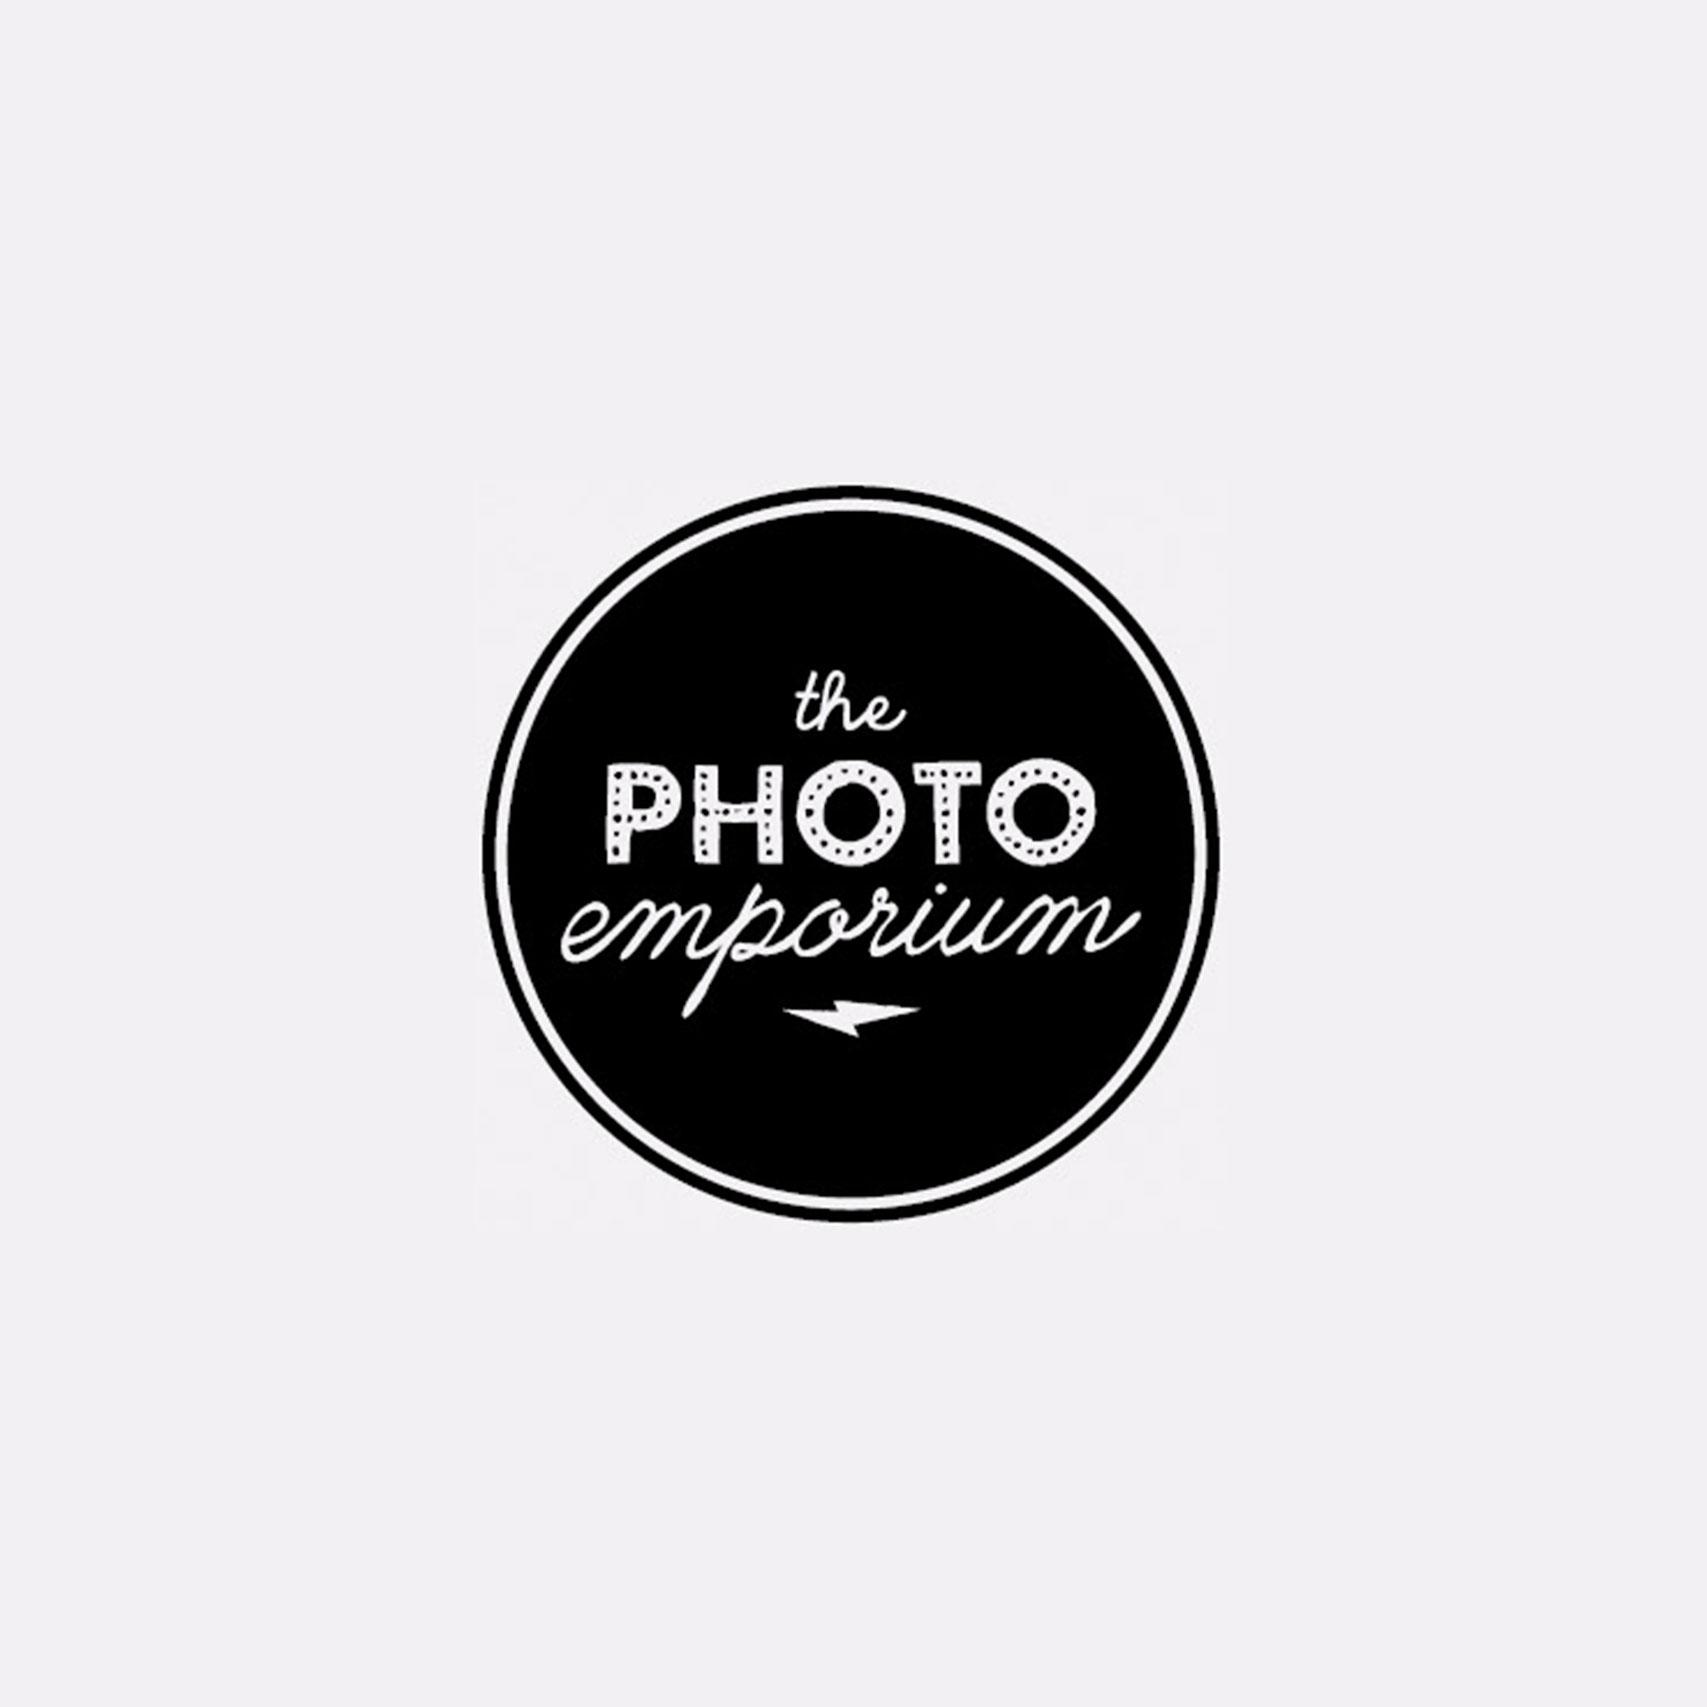 Affordable logo design for The Photo Emporium London